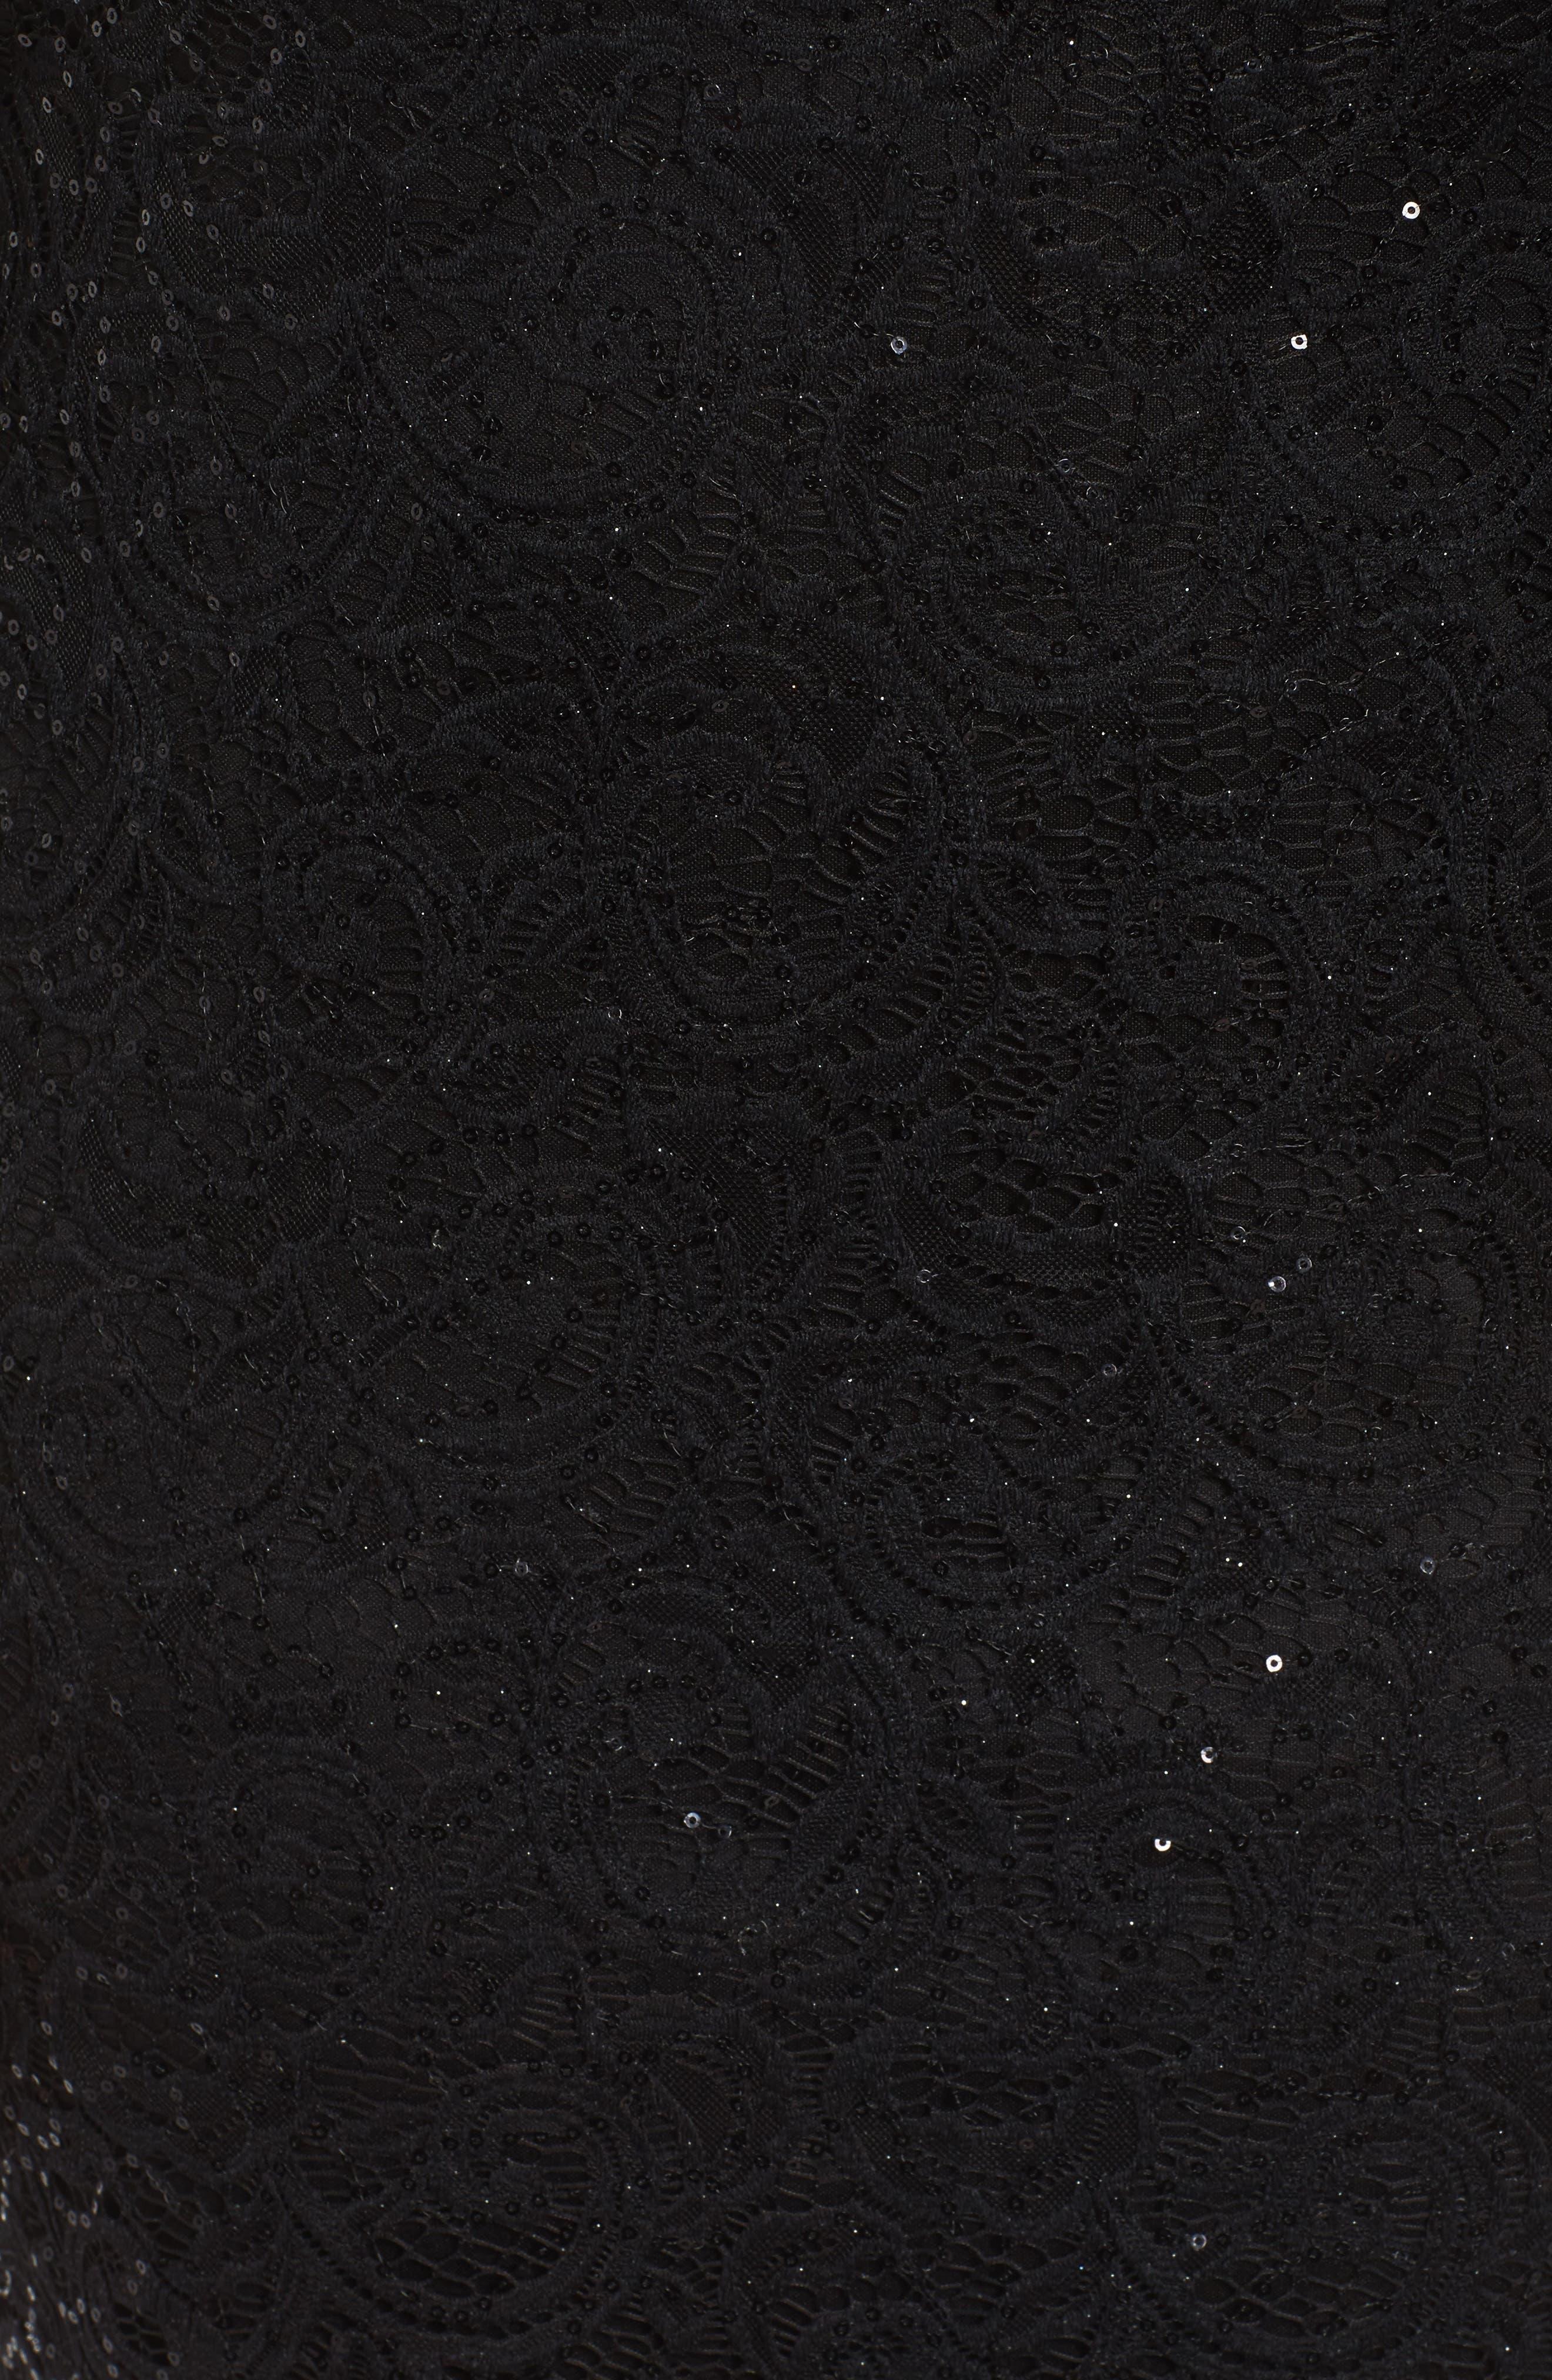 Sequin Keyhole Sheath Dress,                             Alternate thumbnail 5, color,                             001